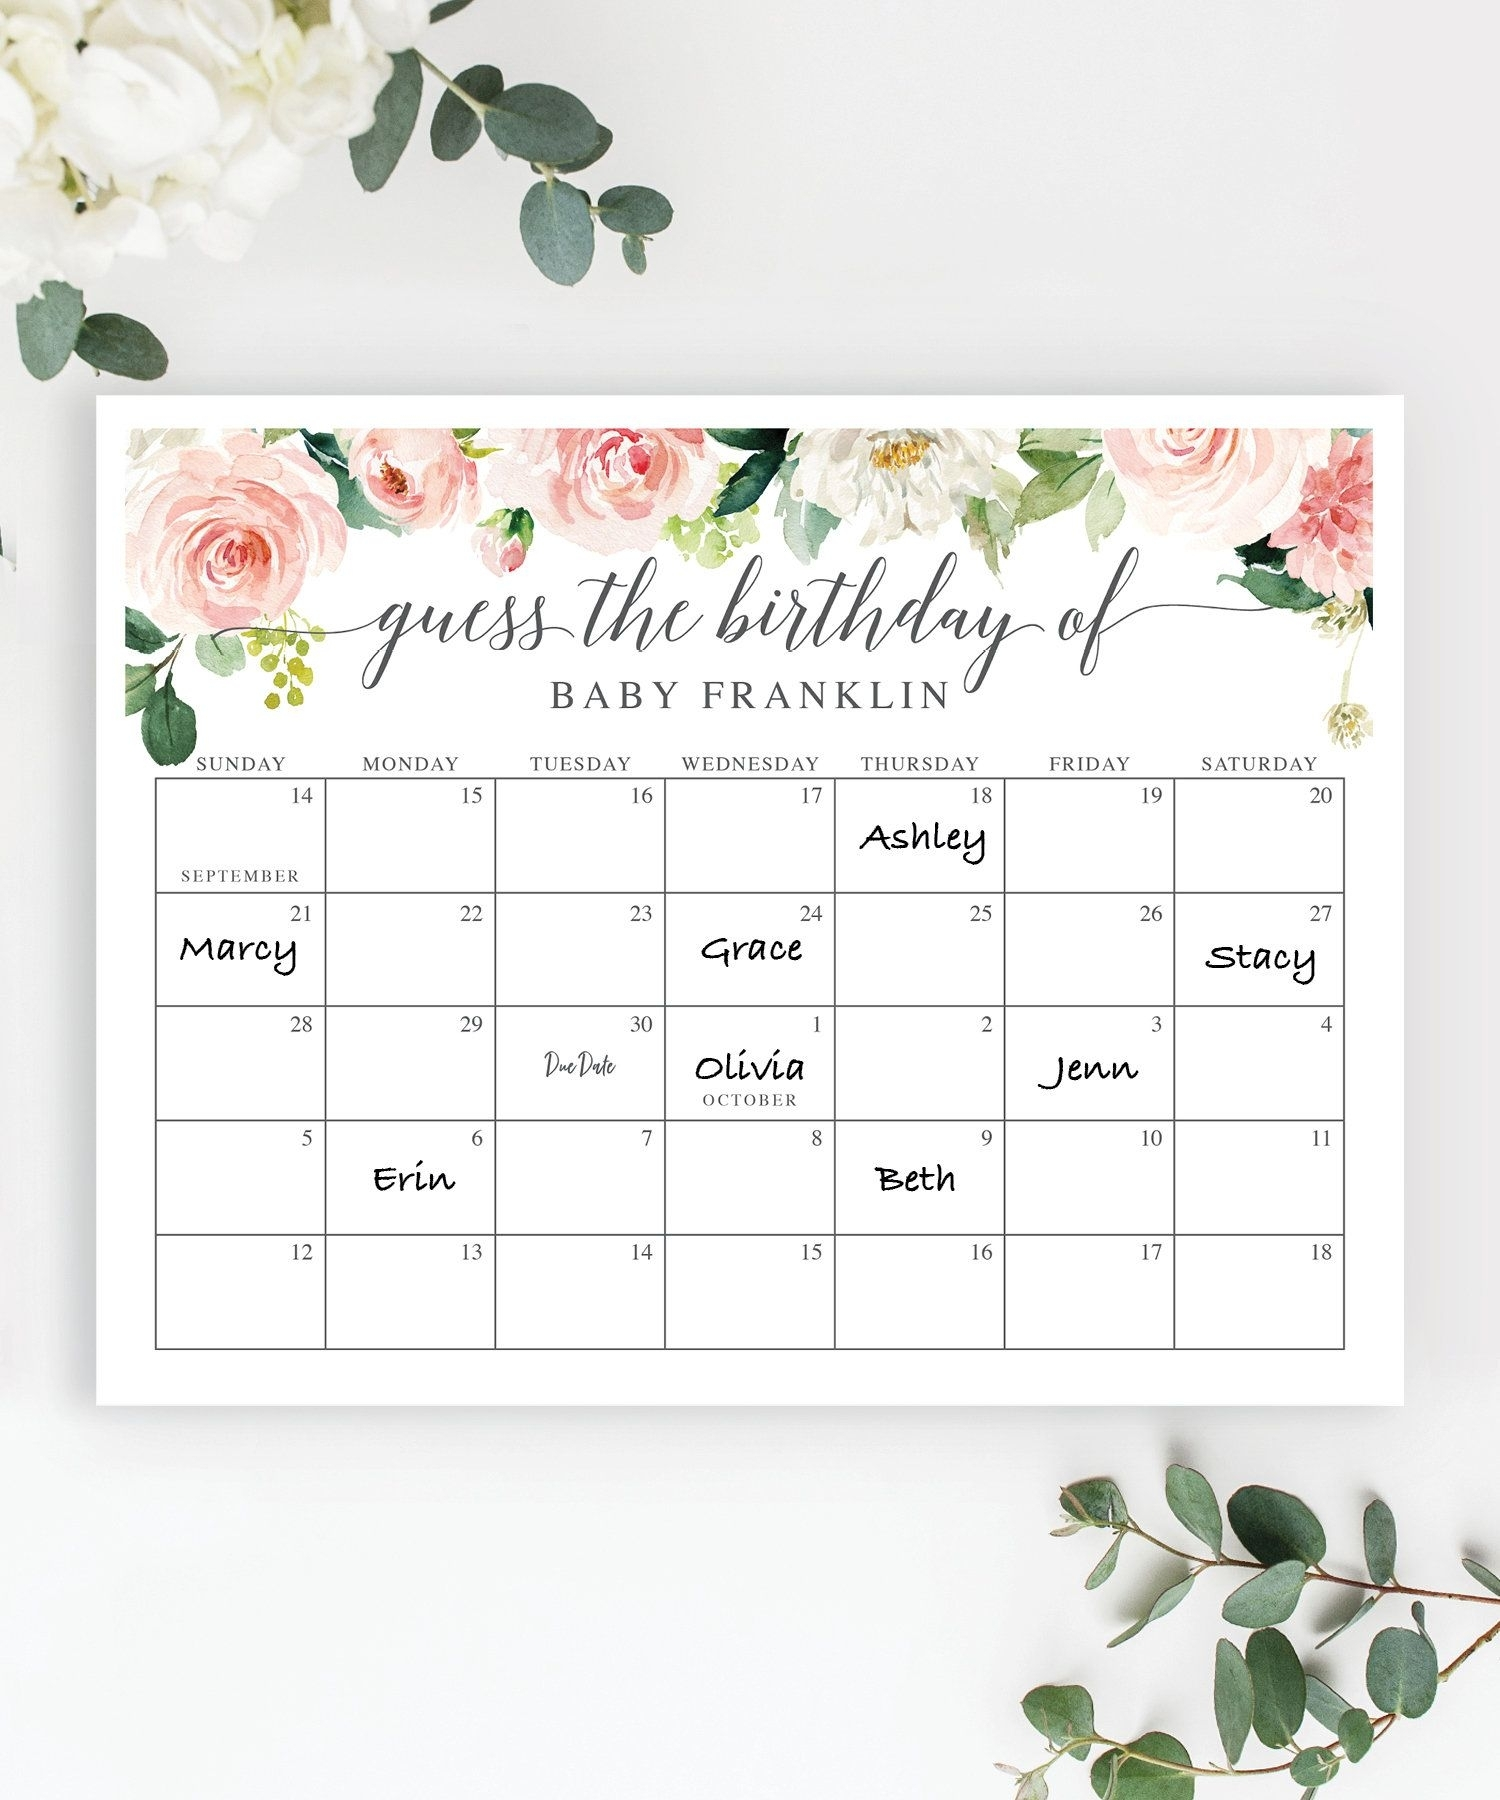 Baby Due Date Calendar - Baby Shower Birthday Prediction